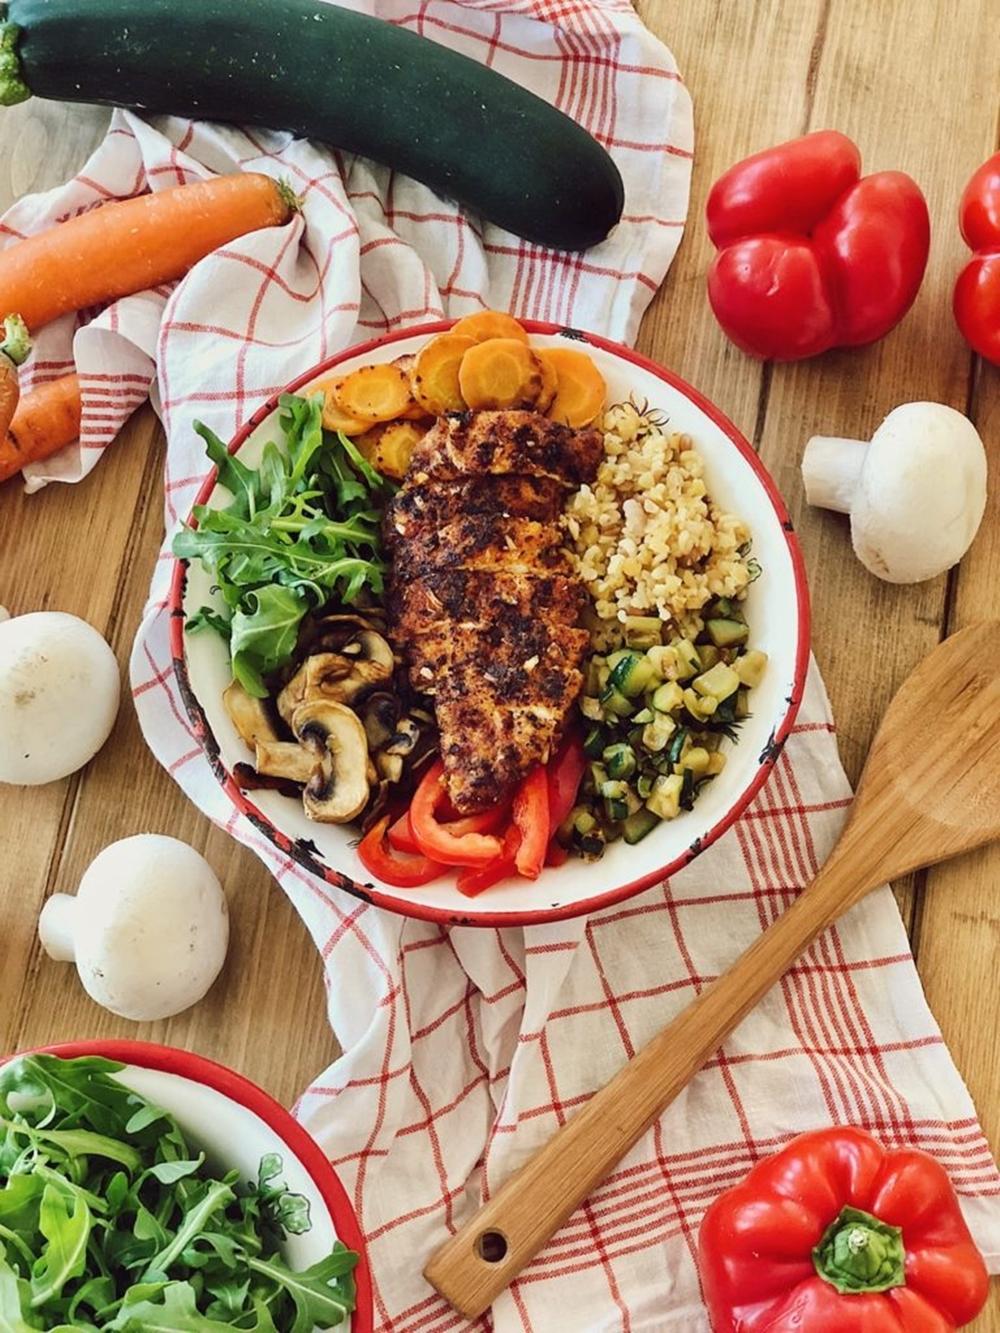 Bunte-Grill-Gemüse-Bowl-Bulgur-knusprigen-Hähnchen-bowl-Rainbow-Poke-Buddha-Happy-healty-summer-food-fashionkitchen-rezept-easy-cooking_2-768x1024